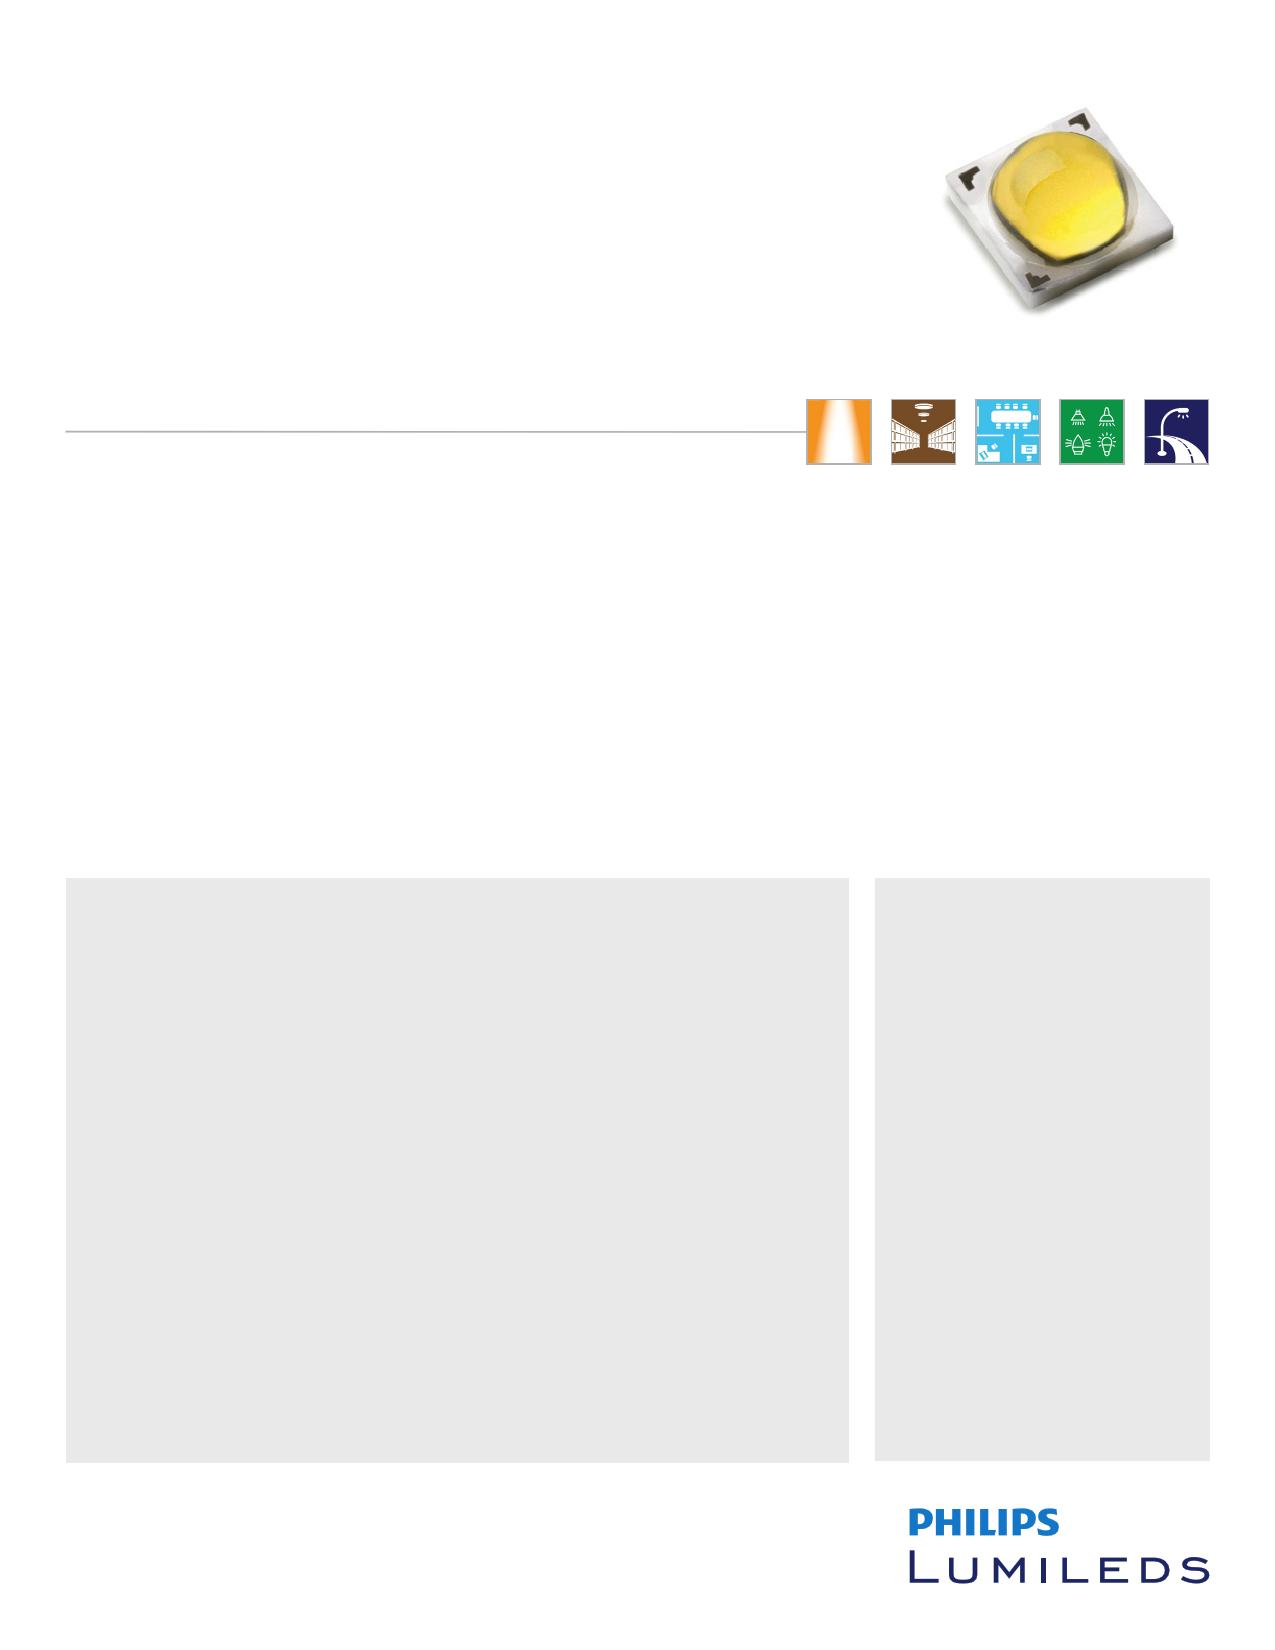 L1T2-4080000000000 datasheet